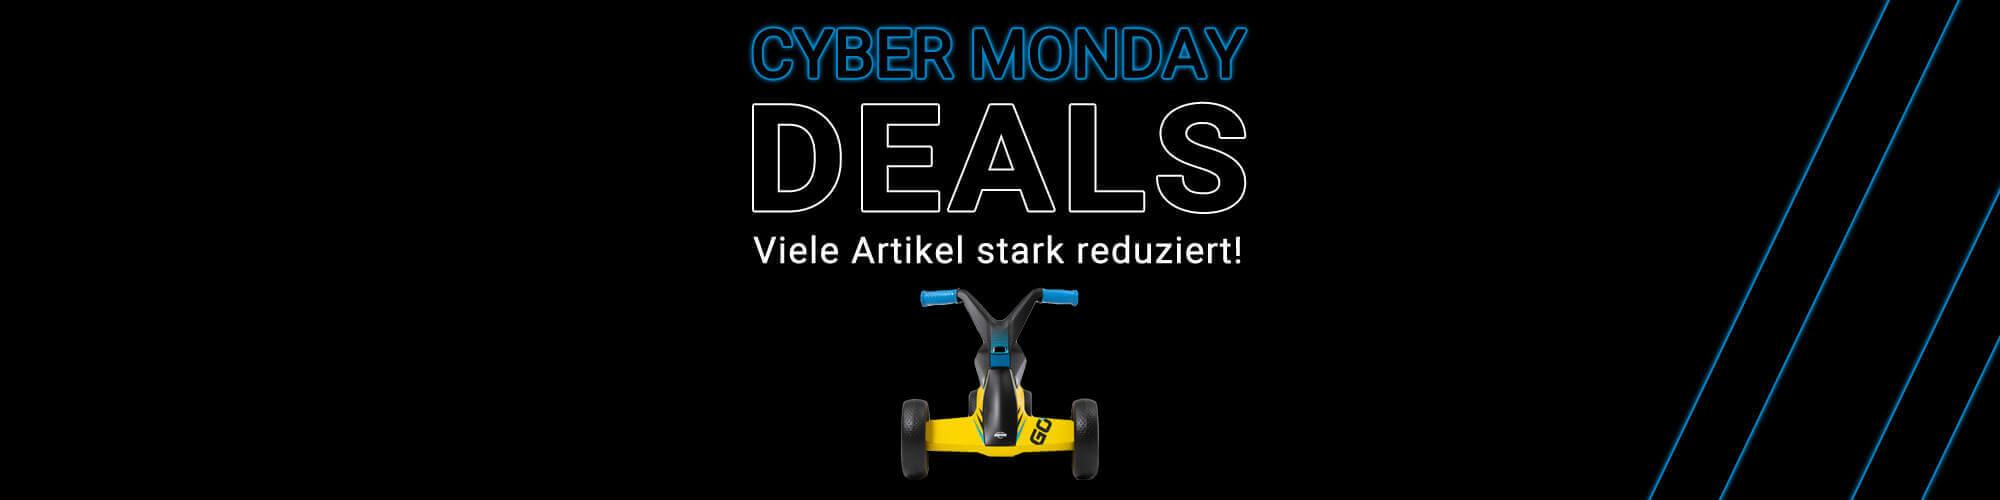 Cyber Monday Deals bei gokart-profi.de